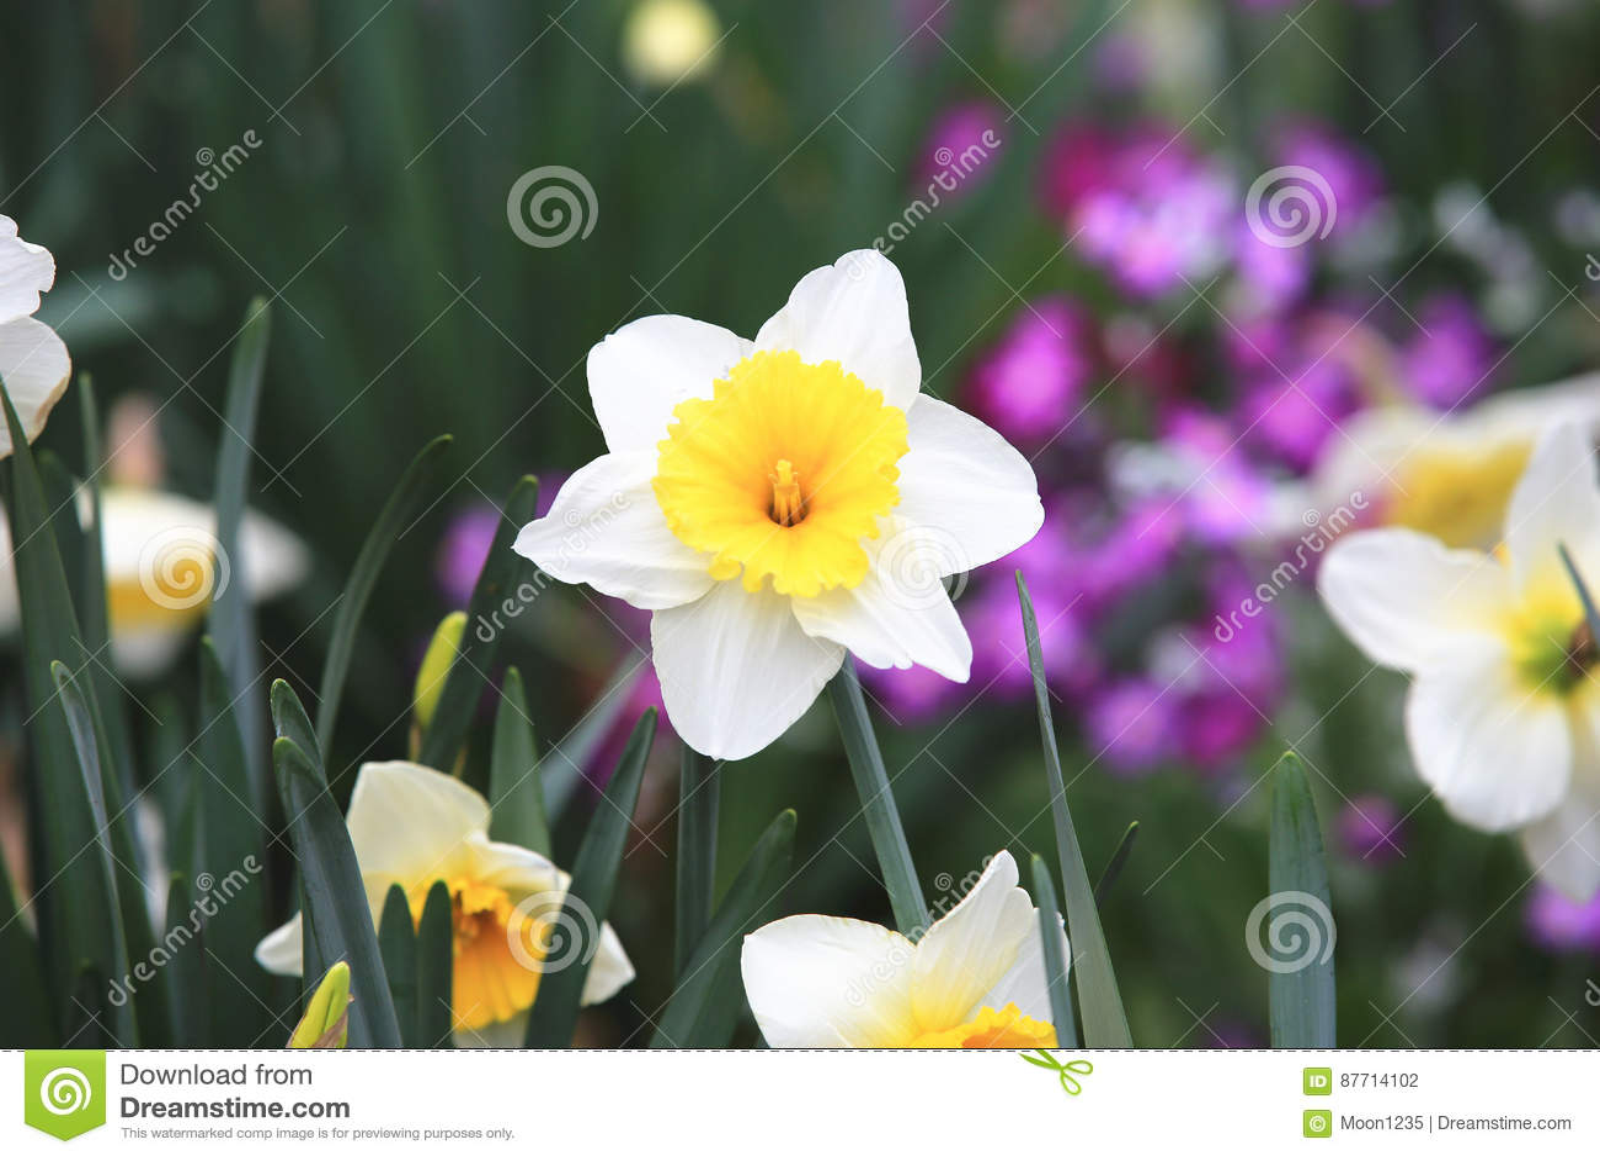 Beautiful Scenery Of Daffodil Flowers Stock Photo Image Of Closeup